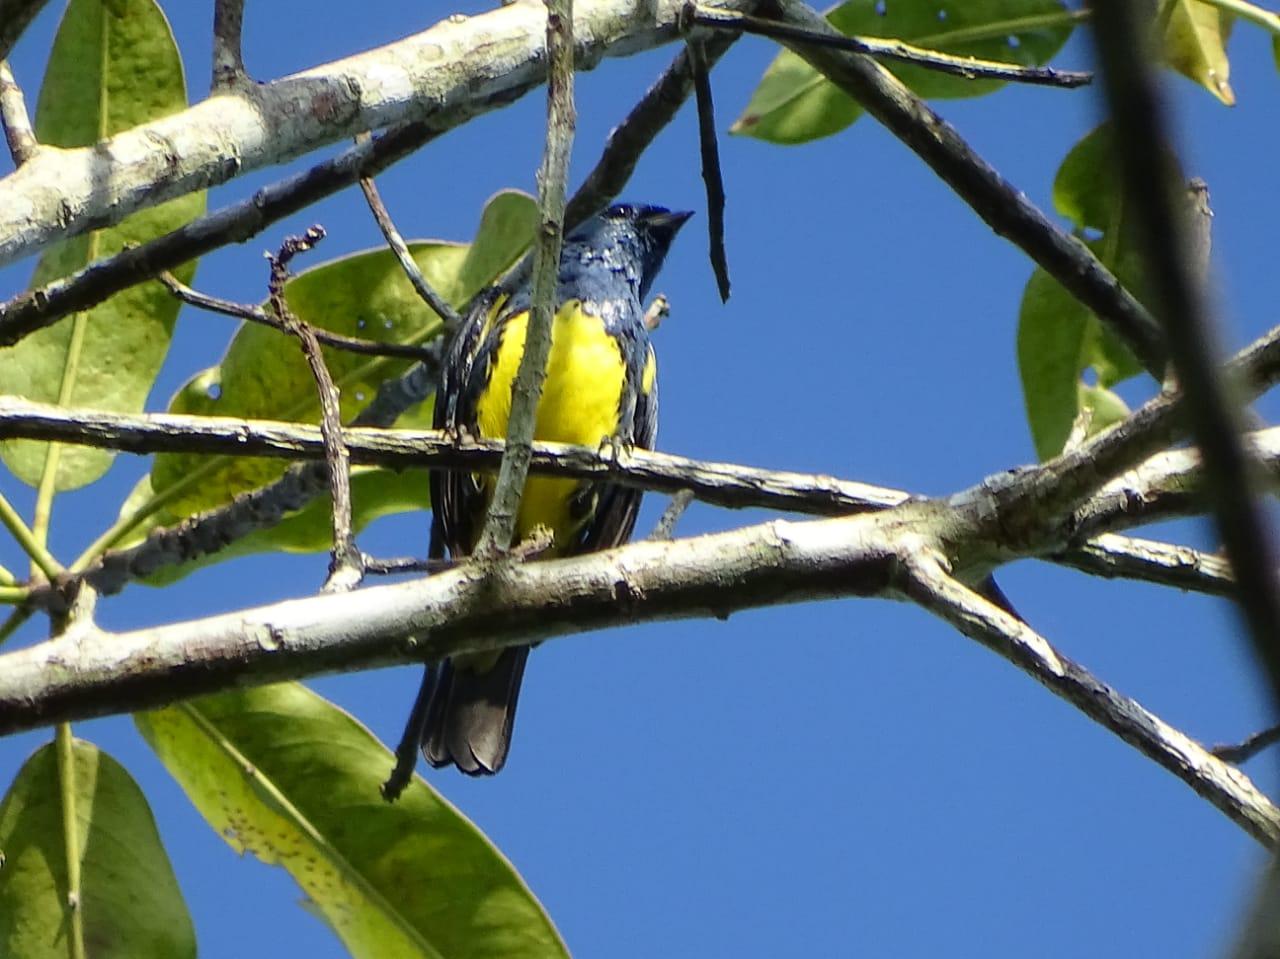 Avistamiento aves Amazonas (1)